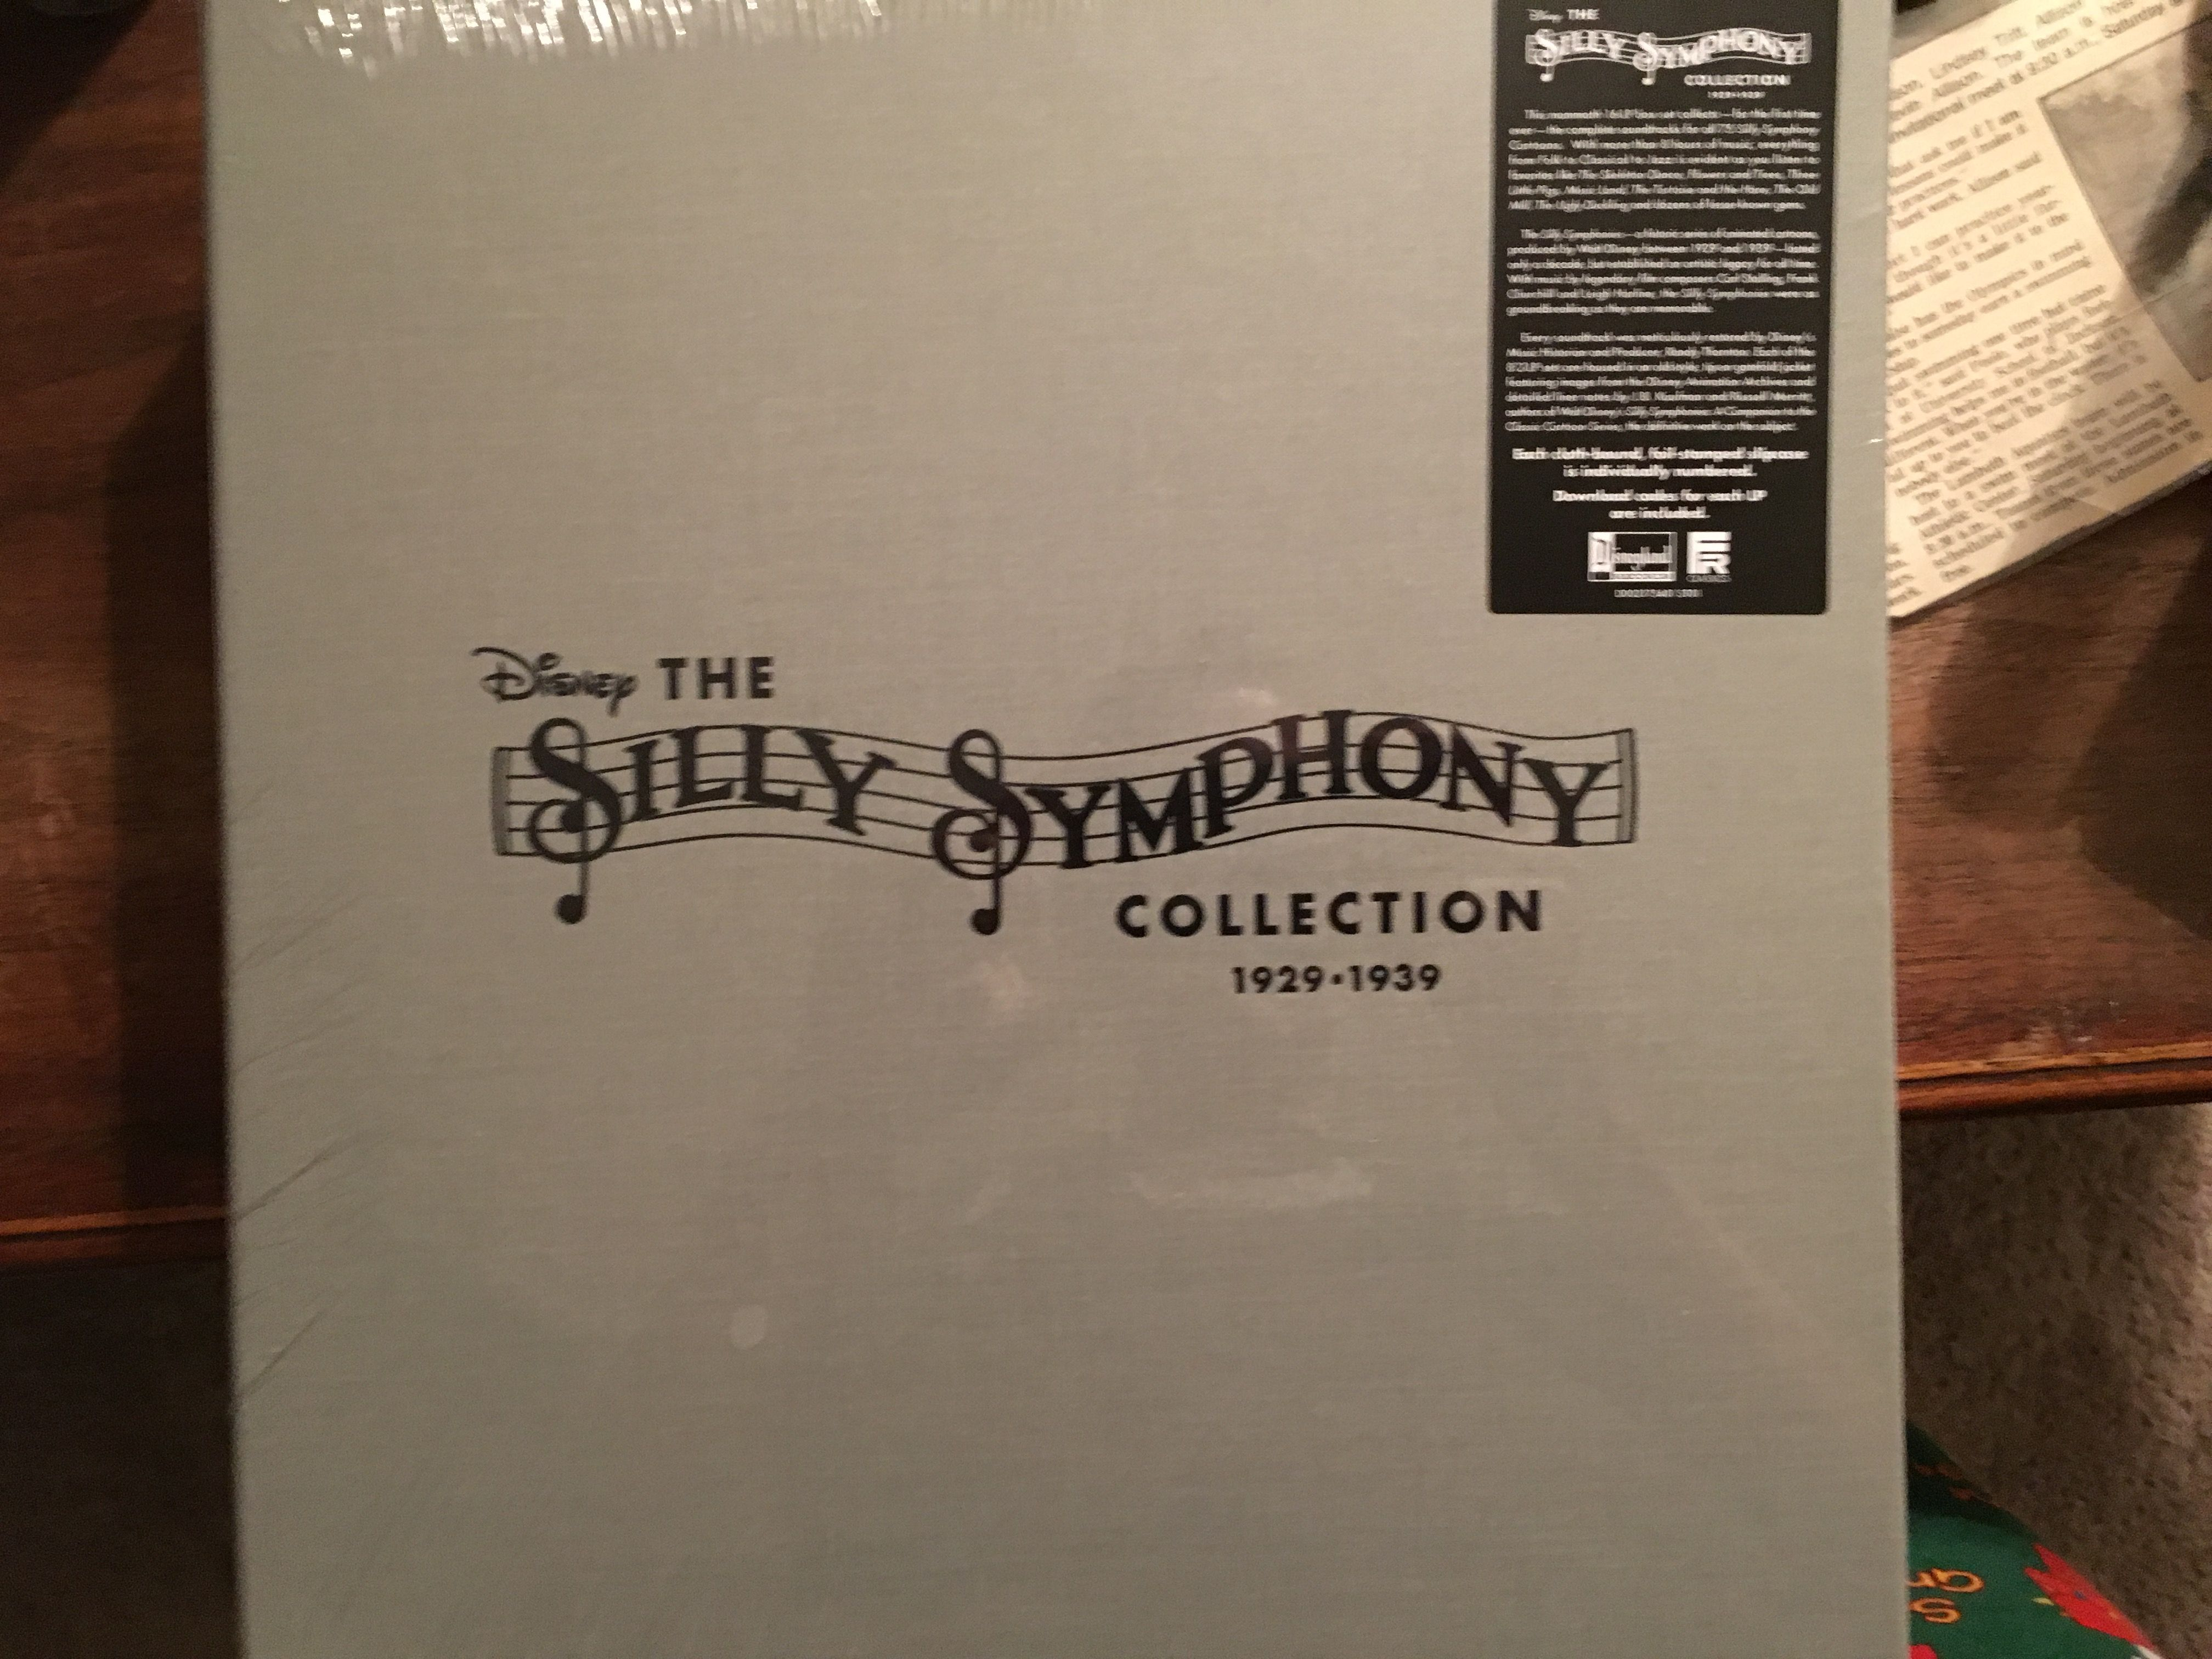 The Silly Symphony Collection 1929 1939 Box Set Vinyl Record Collection Collection Box Vinyl Records